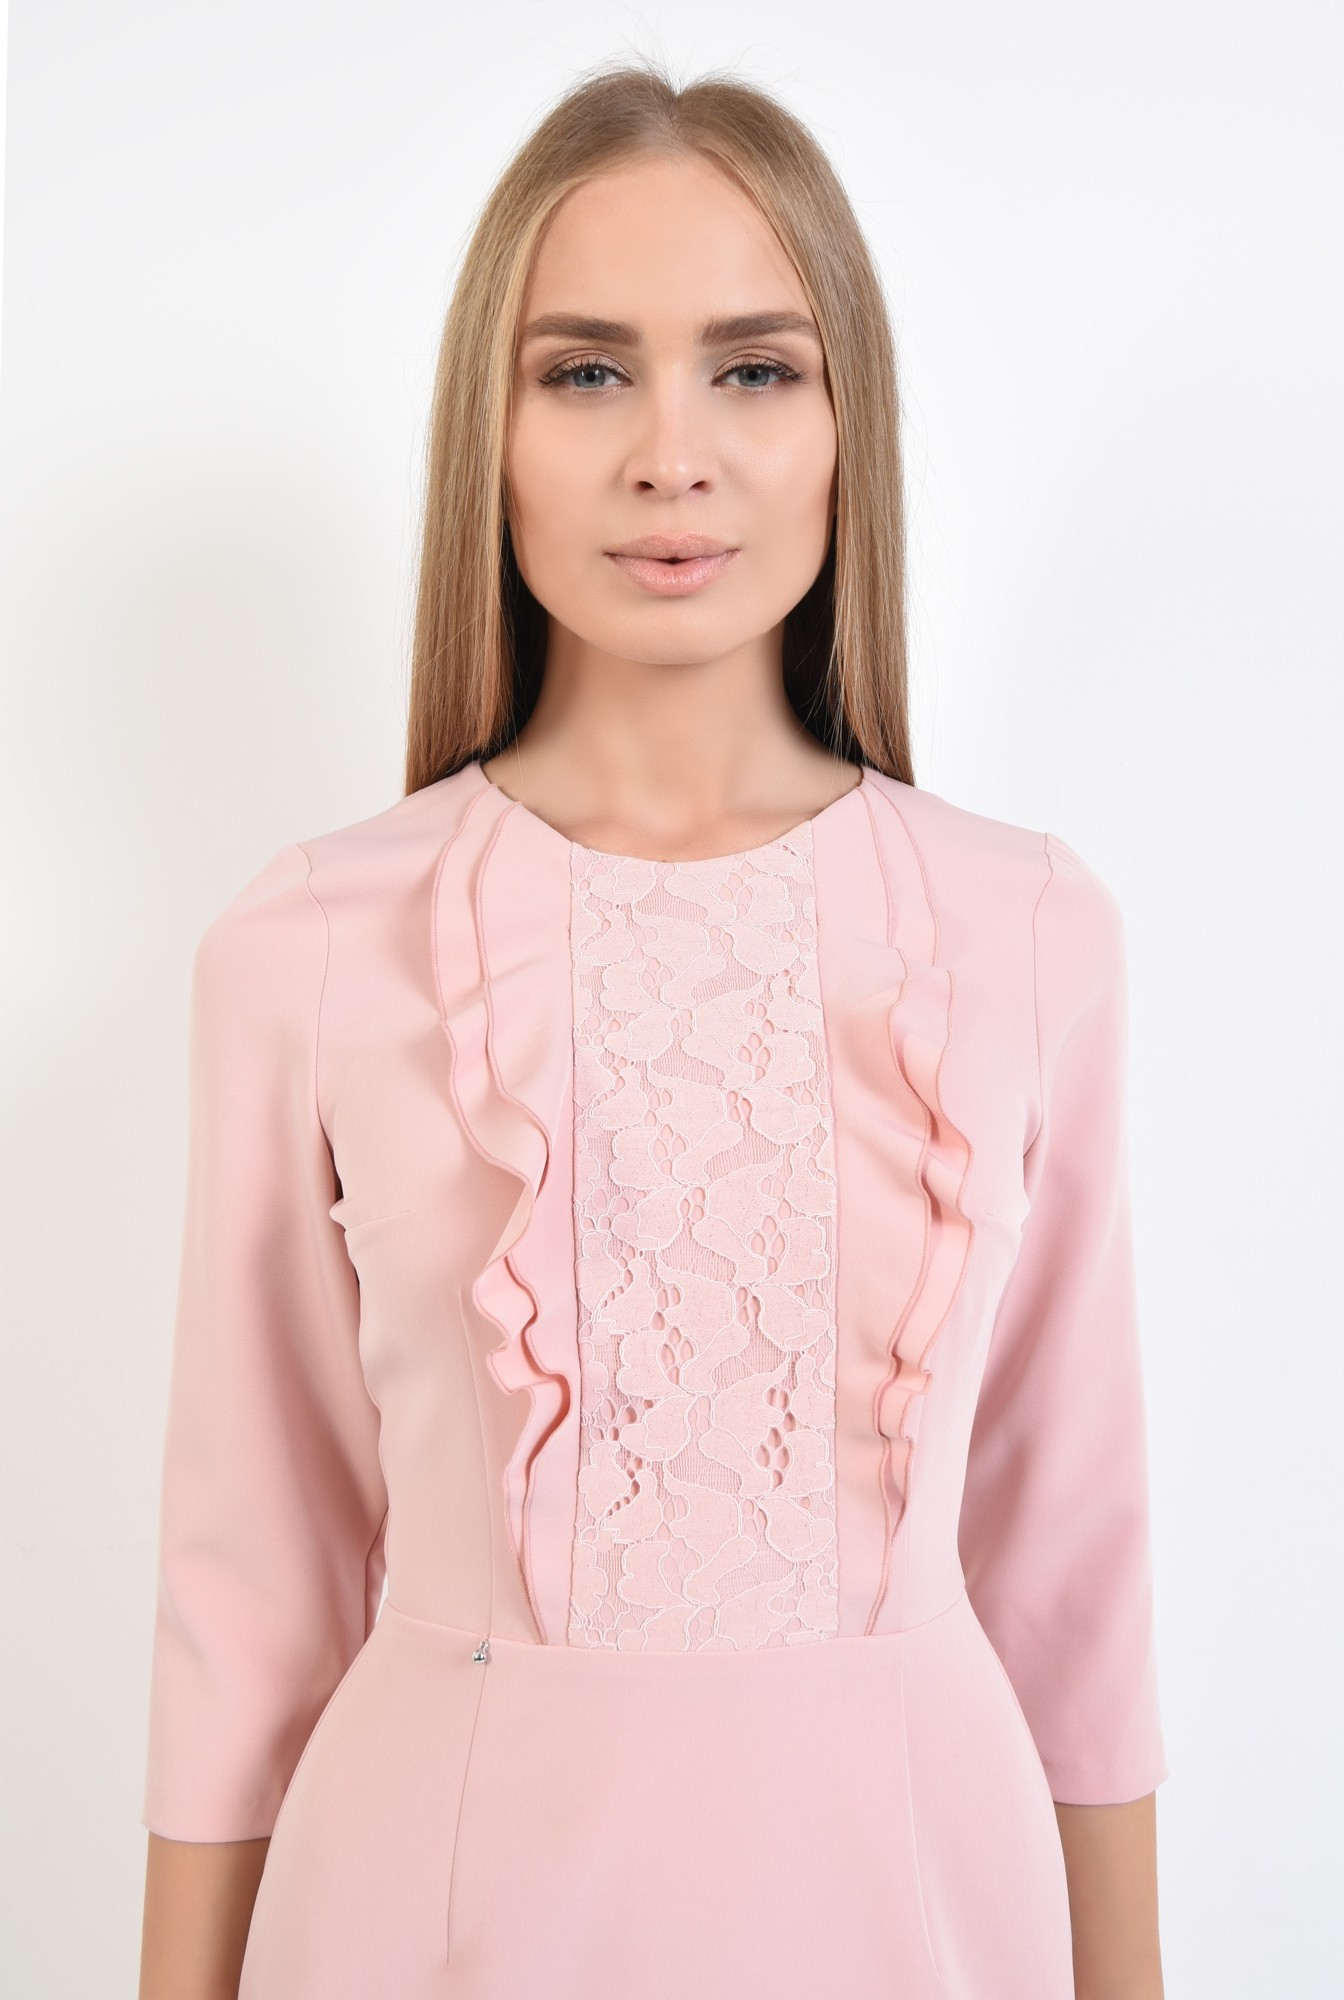 2 - rochie de ocazie, scurta, roz, volane, decolteu rotund